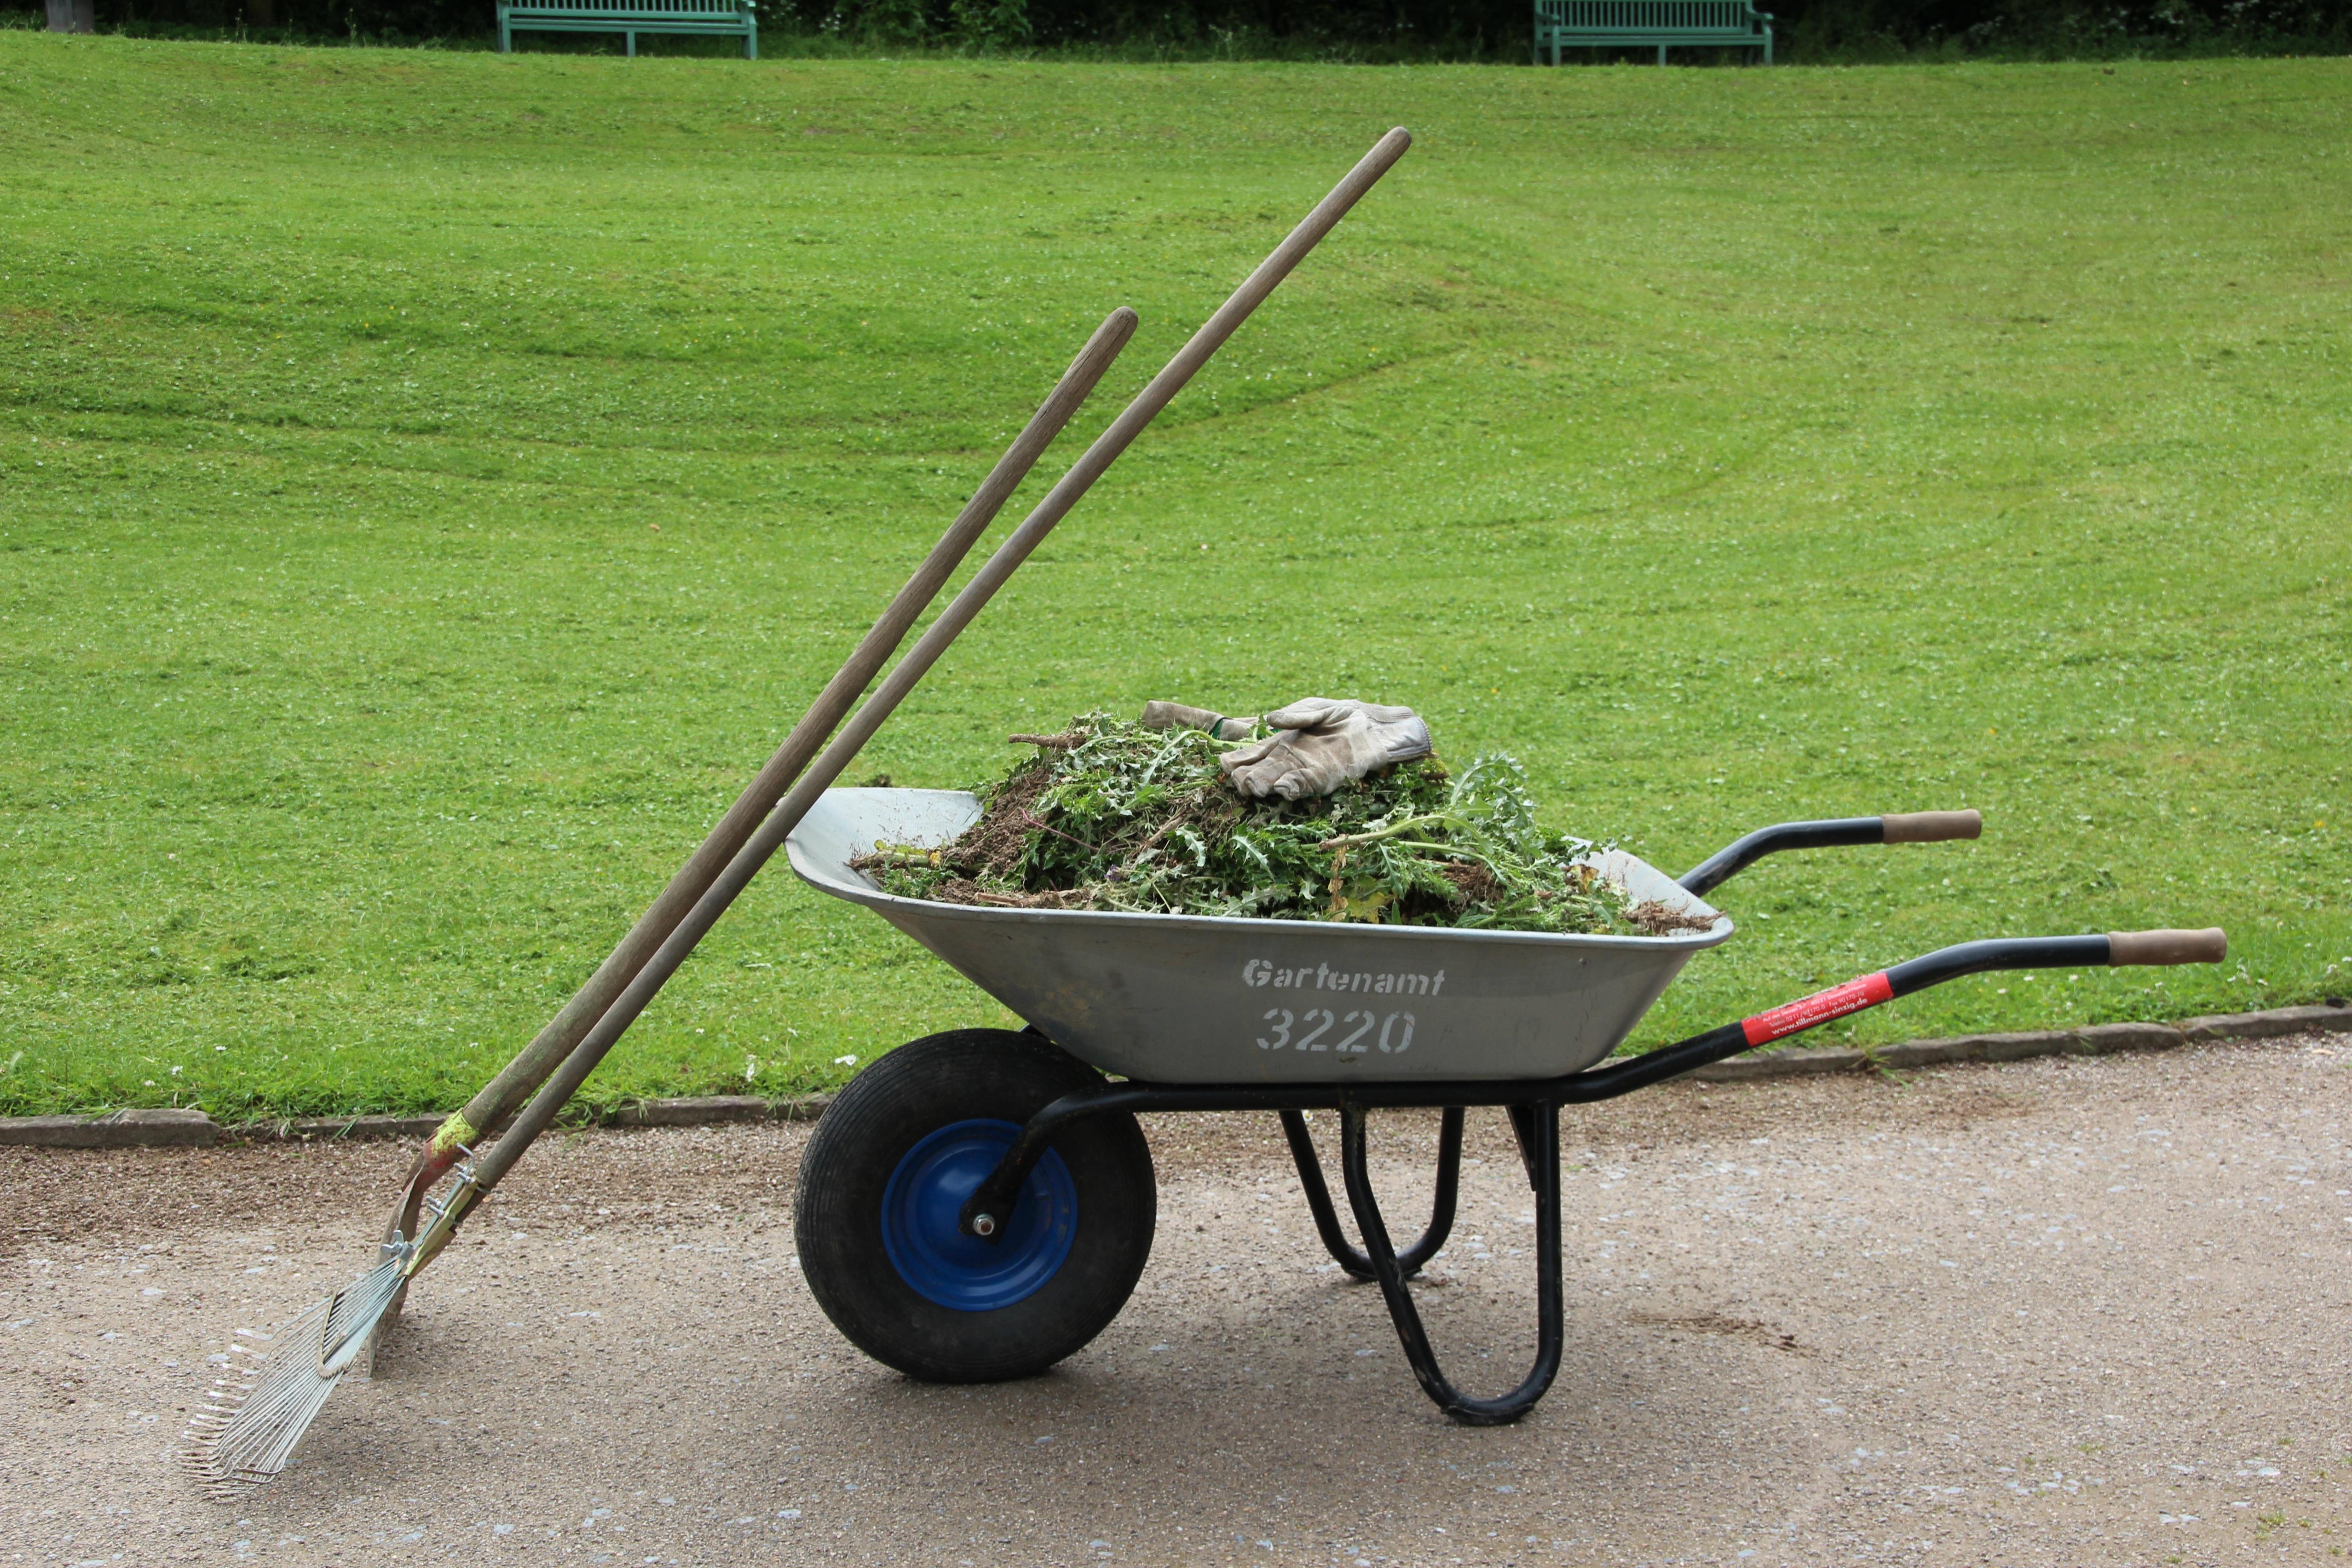 Work Grass Lawn Cart Tool Transport Vehicle Garden Gardening Wheelbarrow  Gardening Equipment Faceplate Land Vehicle